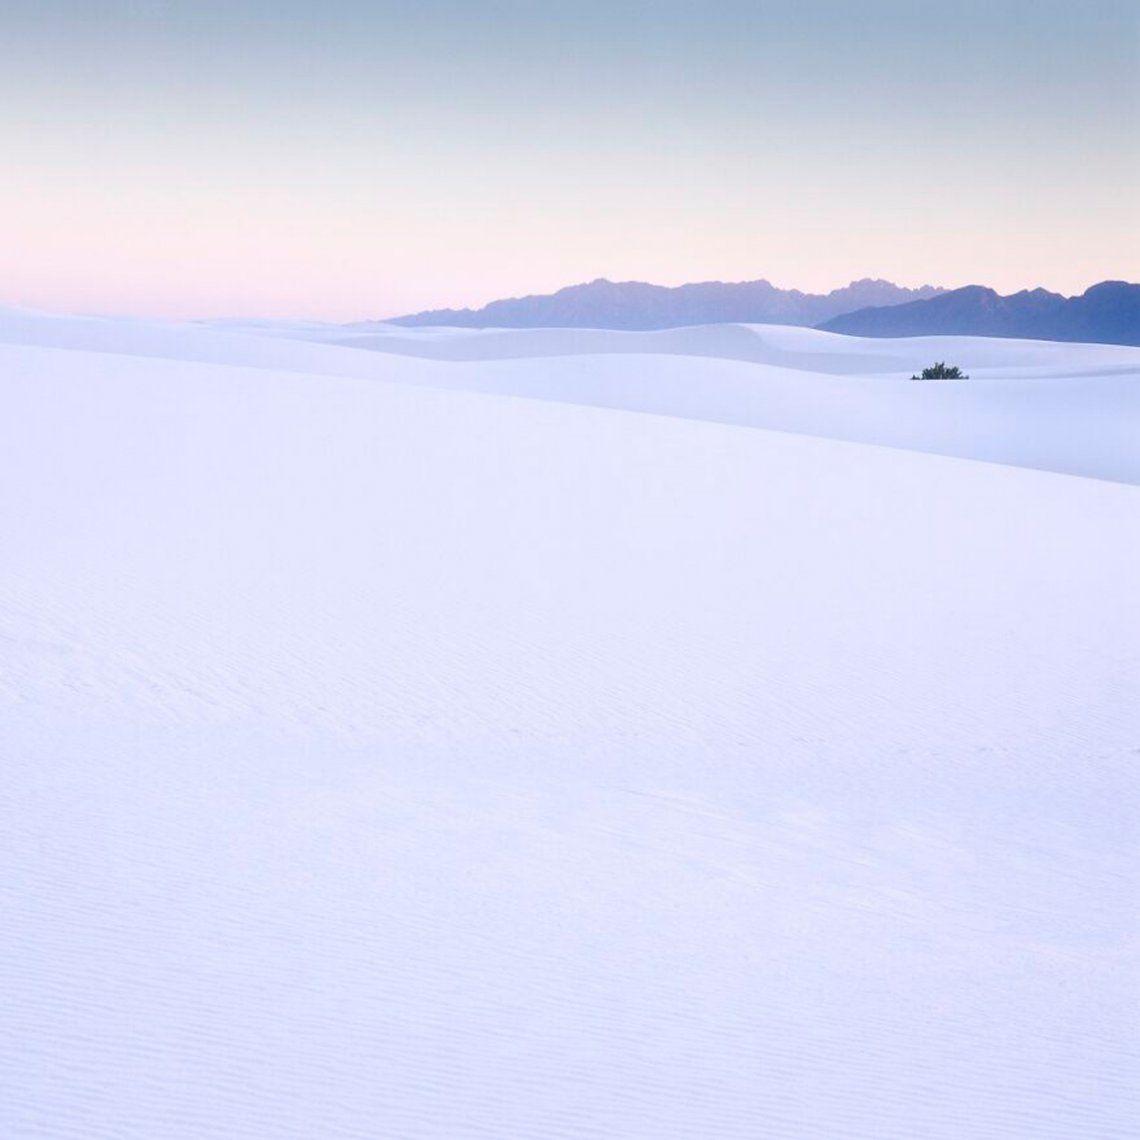 White Sands (2do lugar / Analógico / Cine / Paisaje)